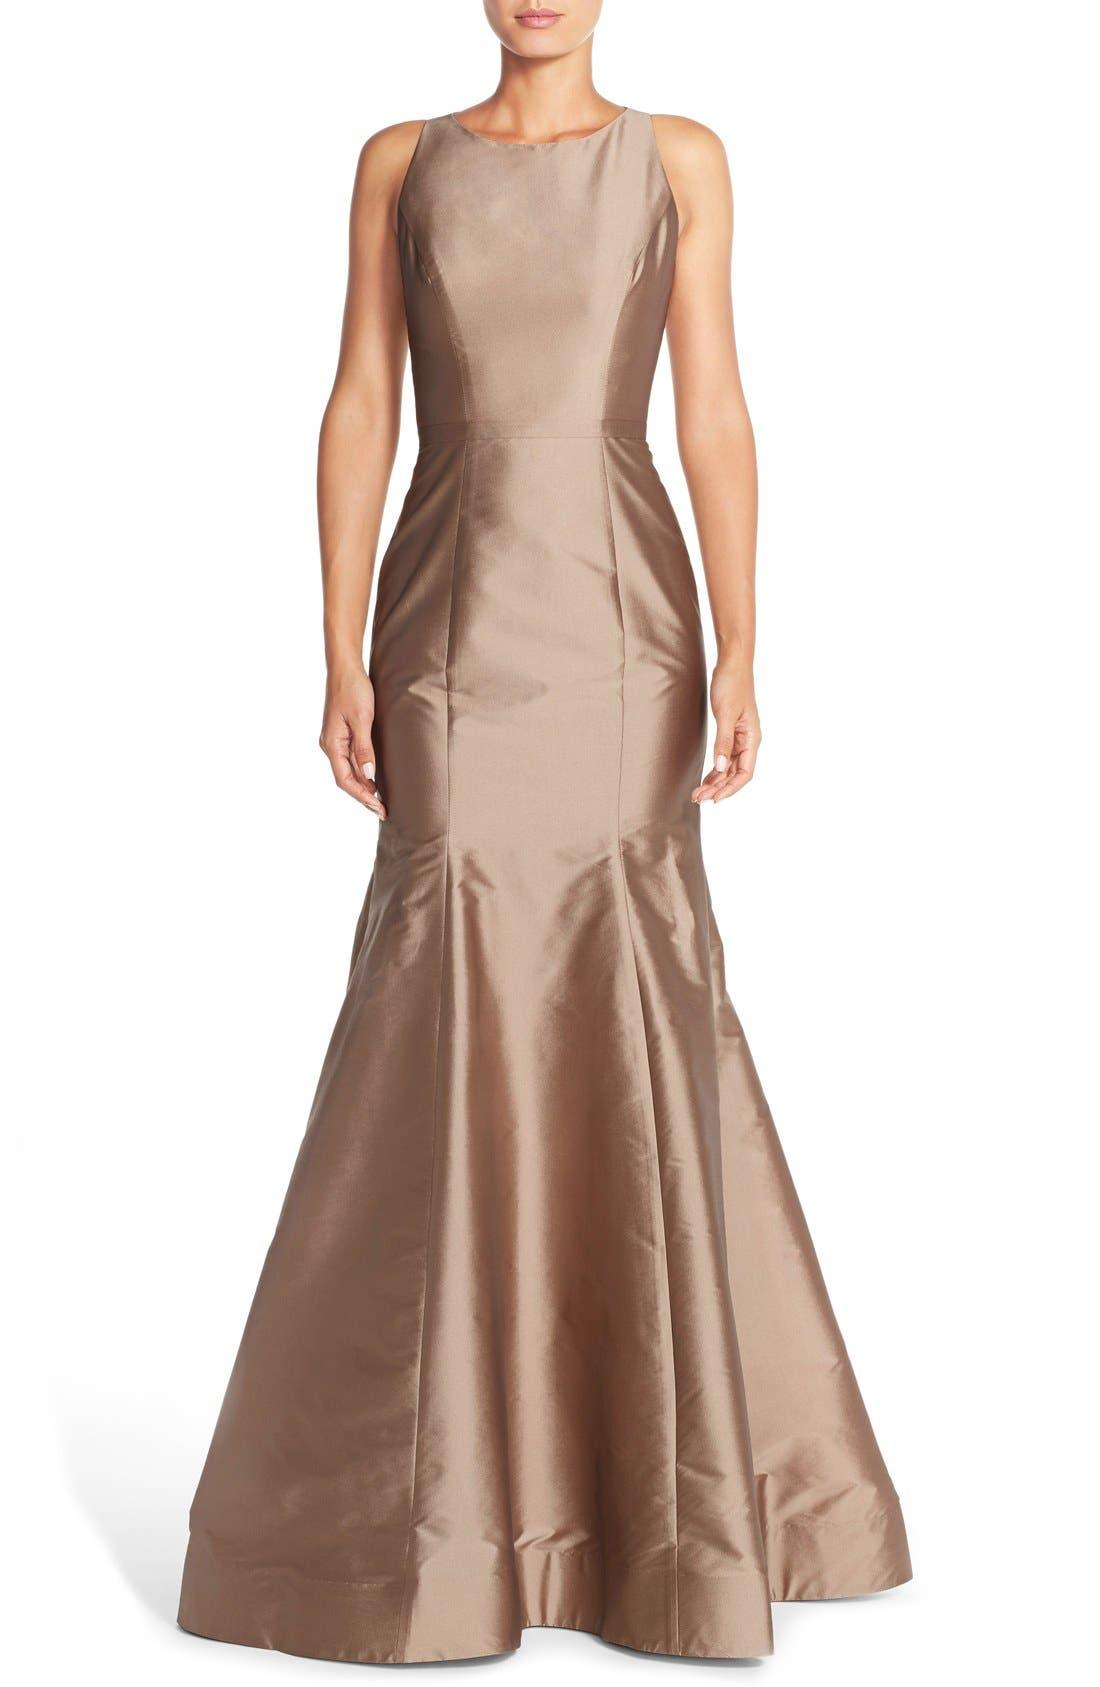 Alternate Image 1 Selected - Monique Lhuillier Bridesmaids Back Cutout Taffeta Mermaid Gown